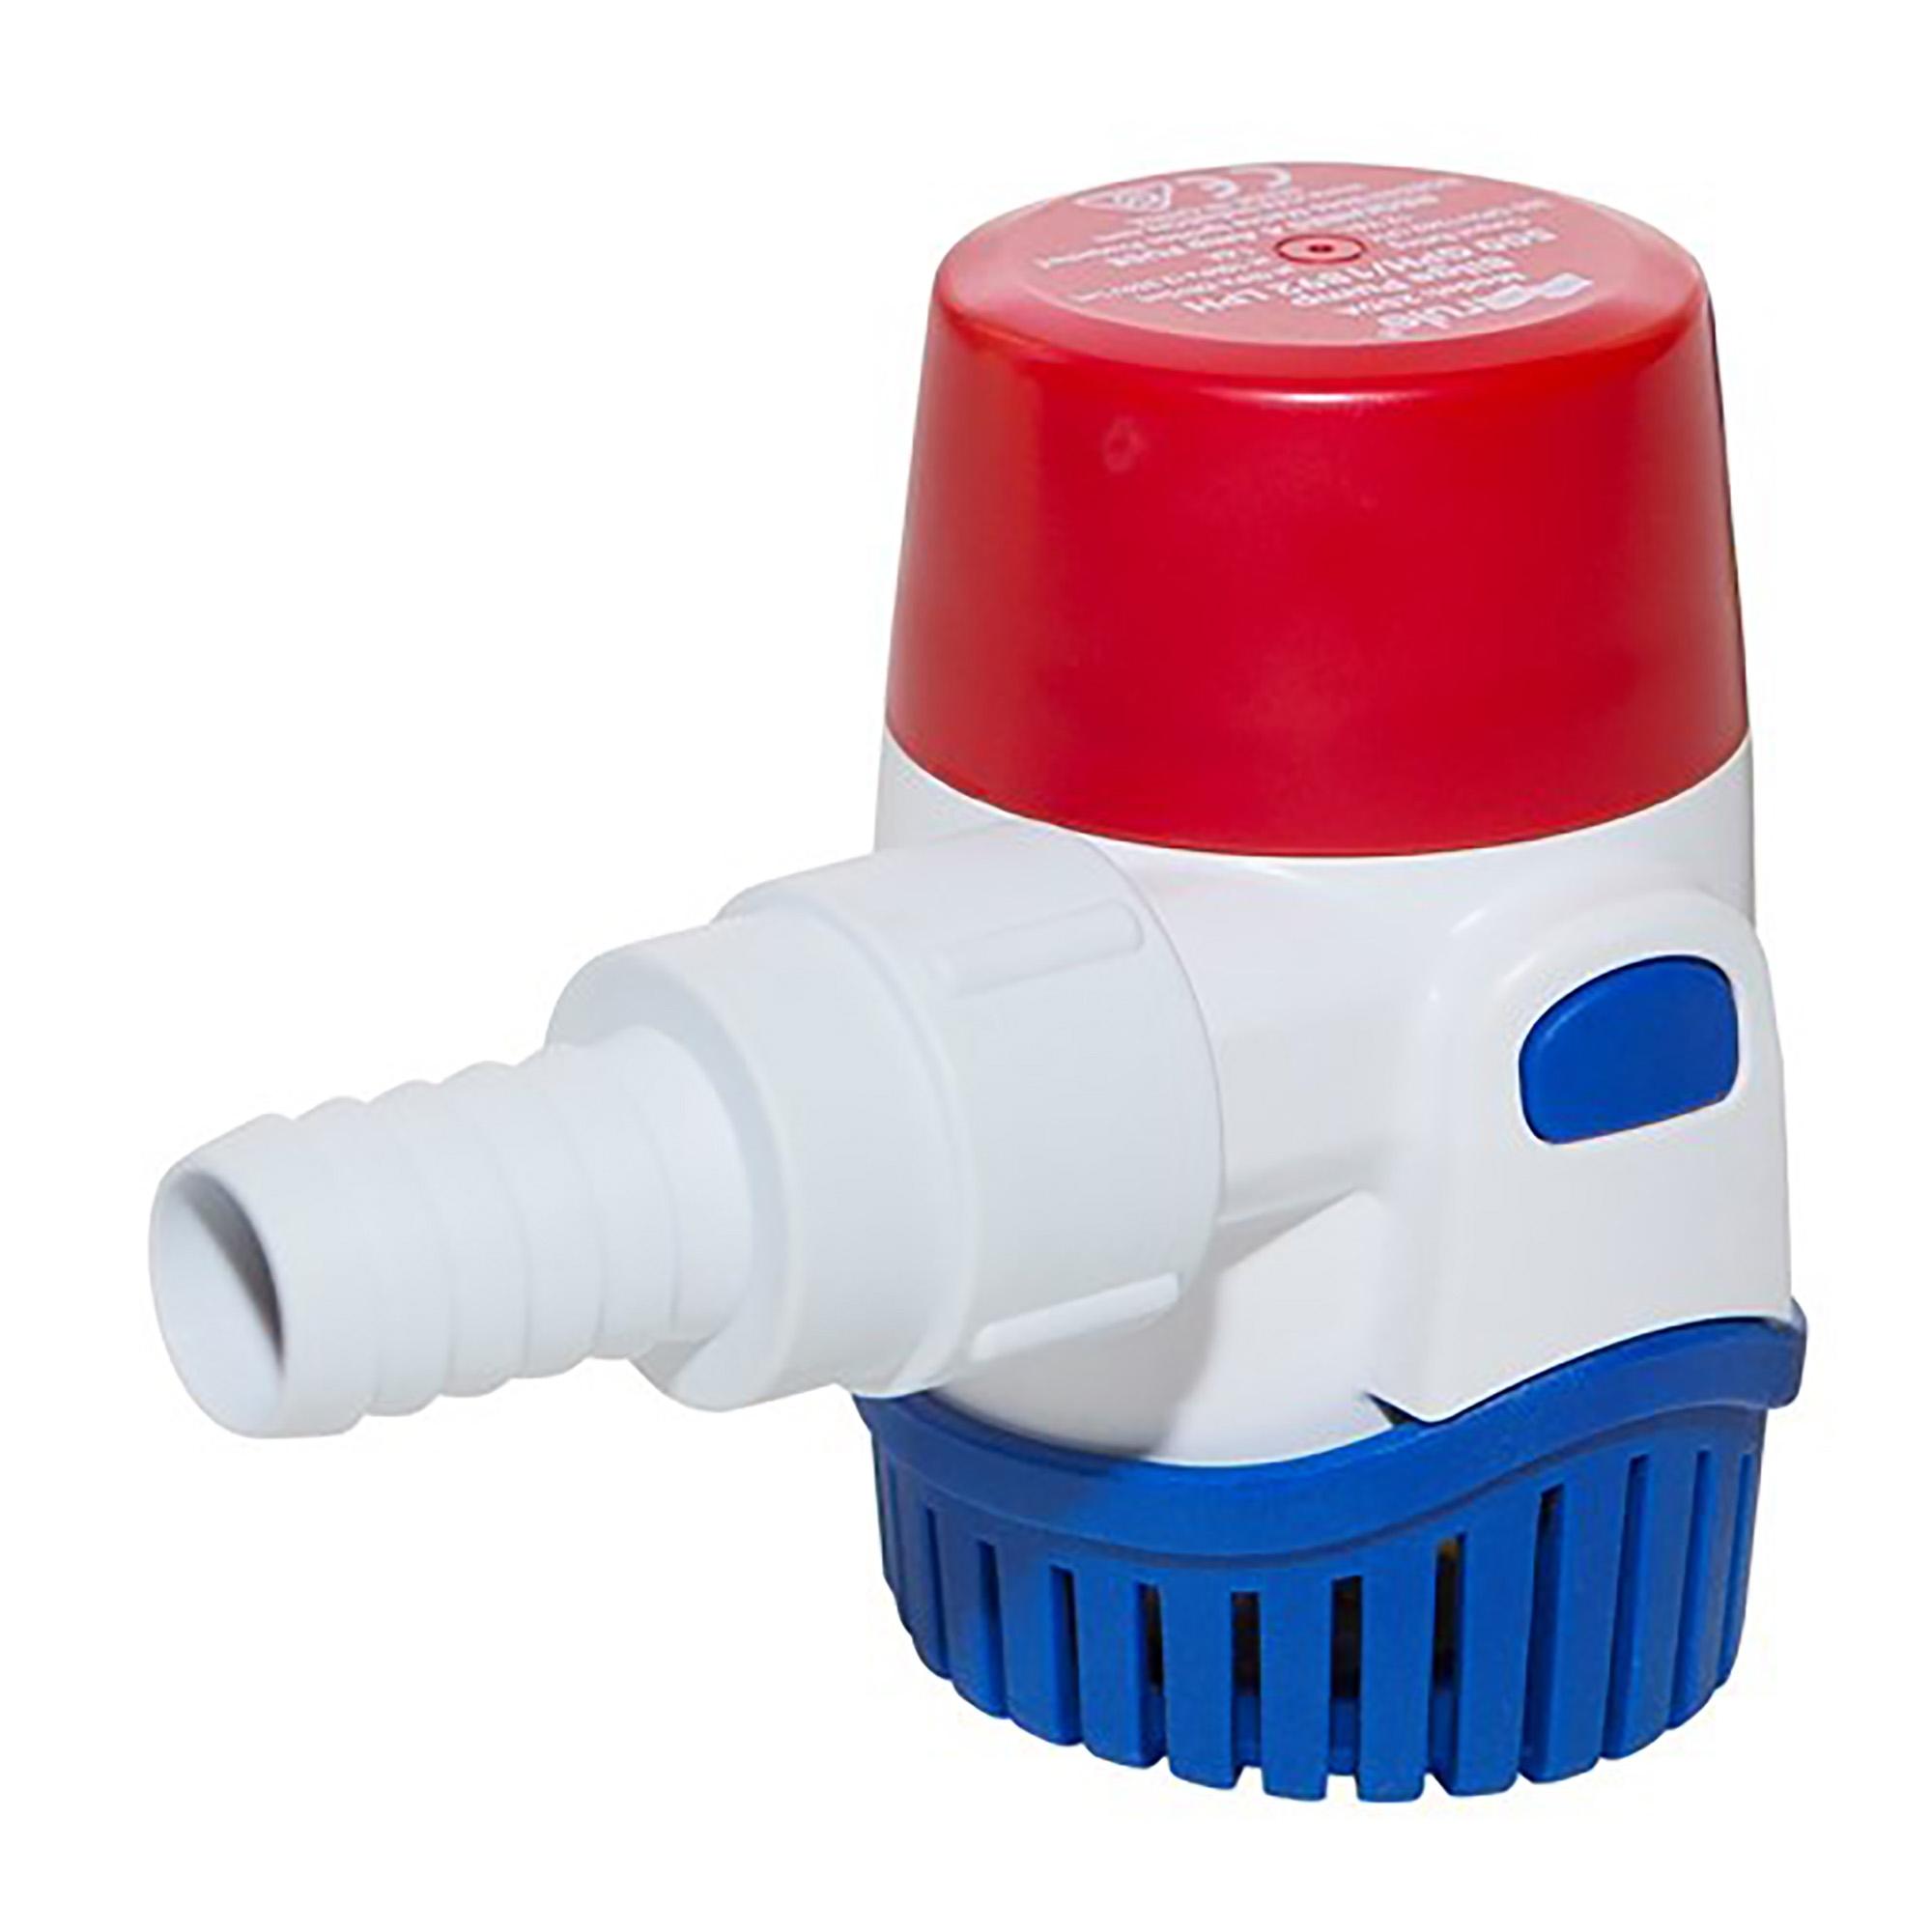 Rule 25SA Automatic Bilge Pump 500 GPH